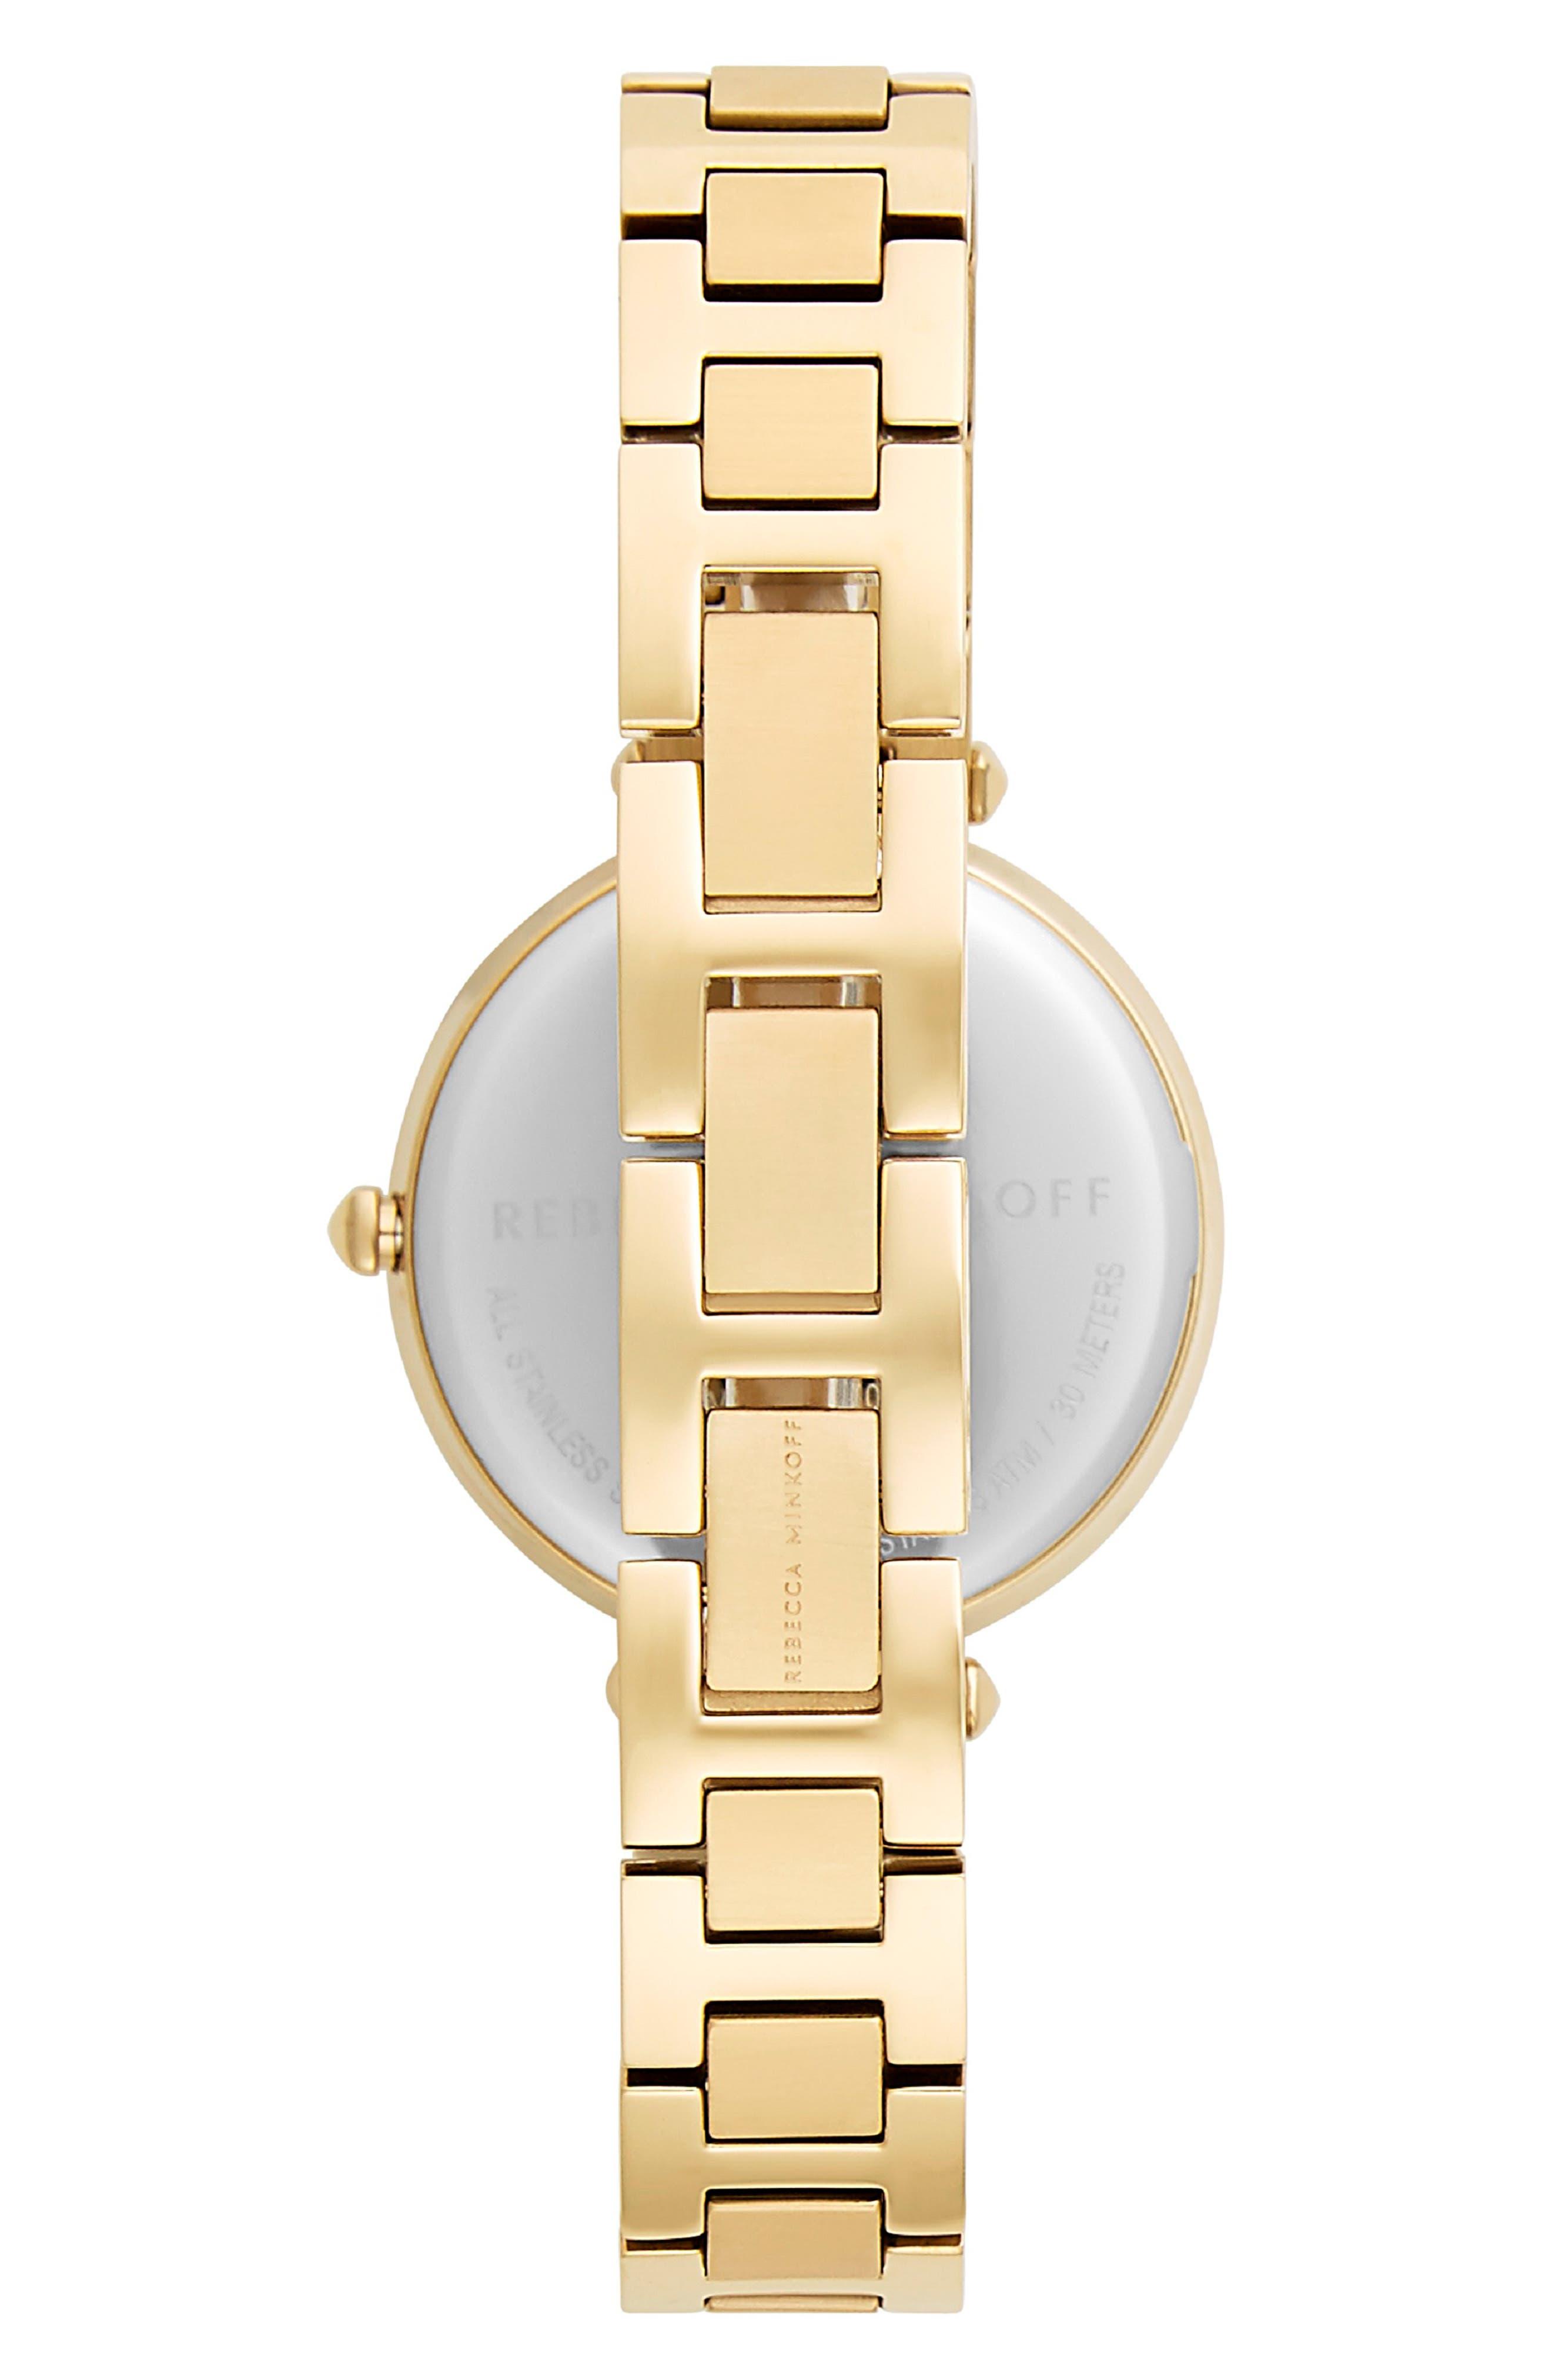 REBECCA MINKOFF, T-Bar Bracelet Strap Watch, 33mm, Alternate thumbnail 2, color, GOLD/ BLACK/ GOLD